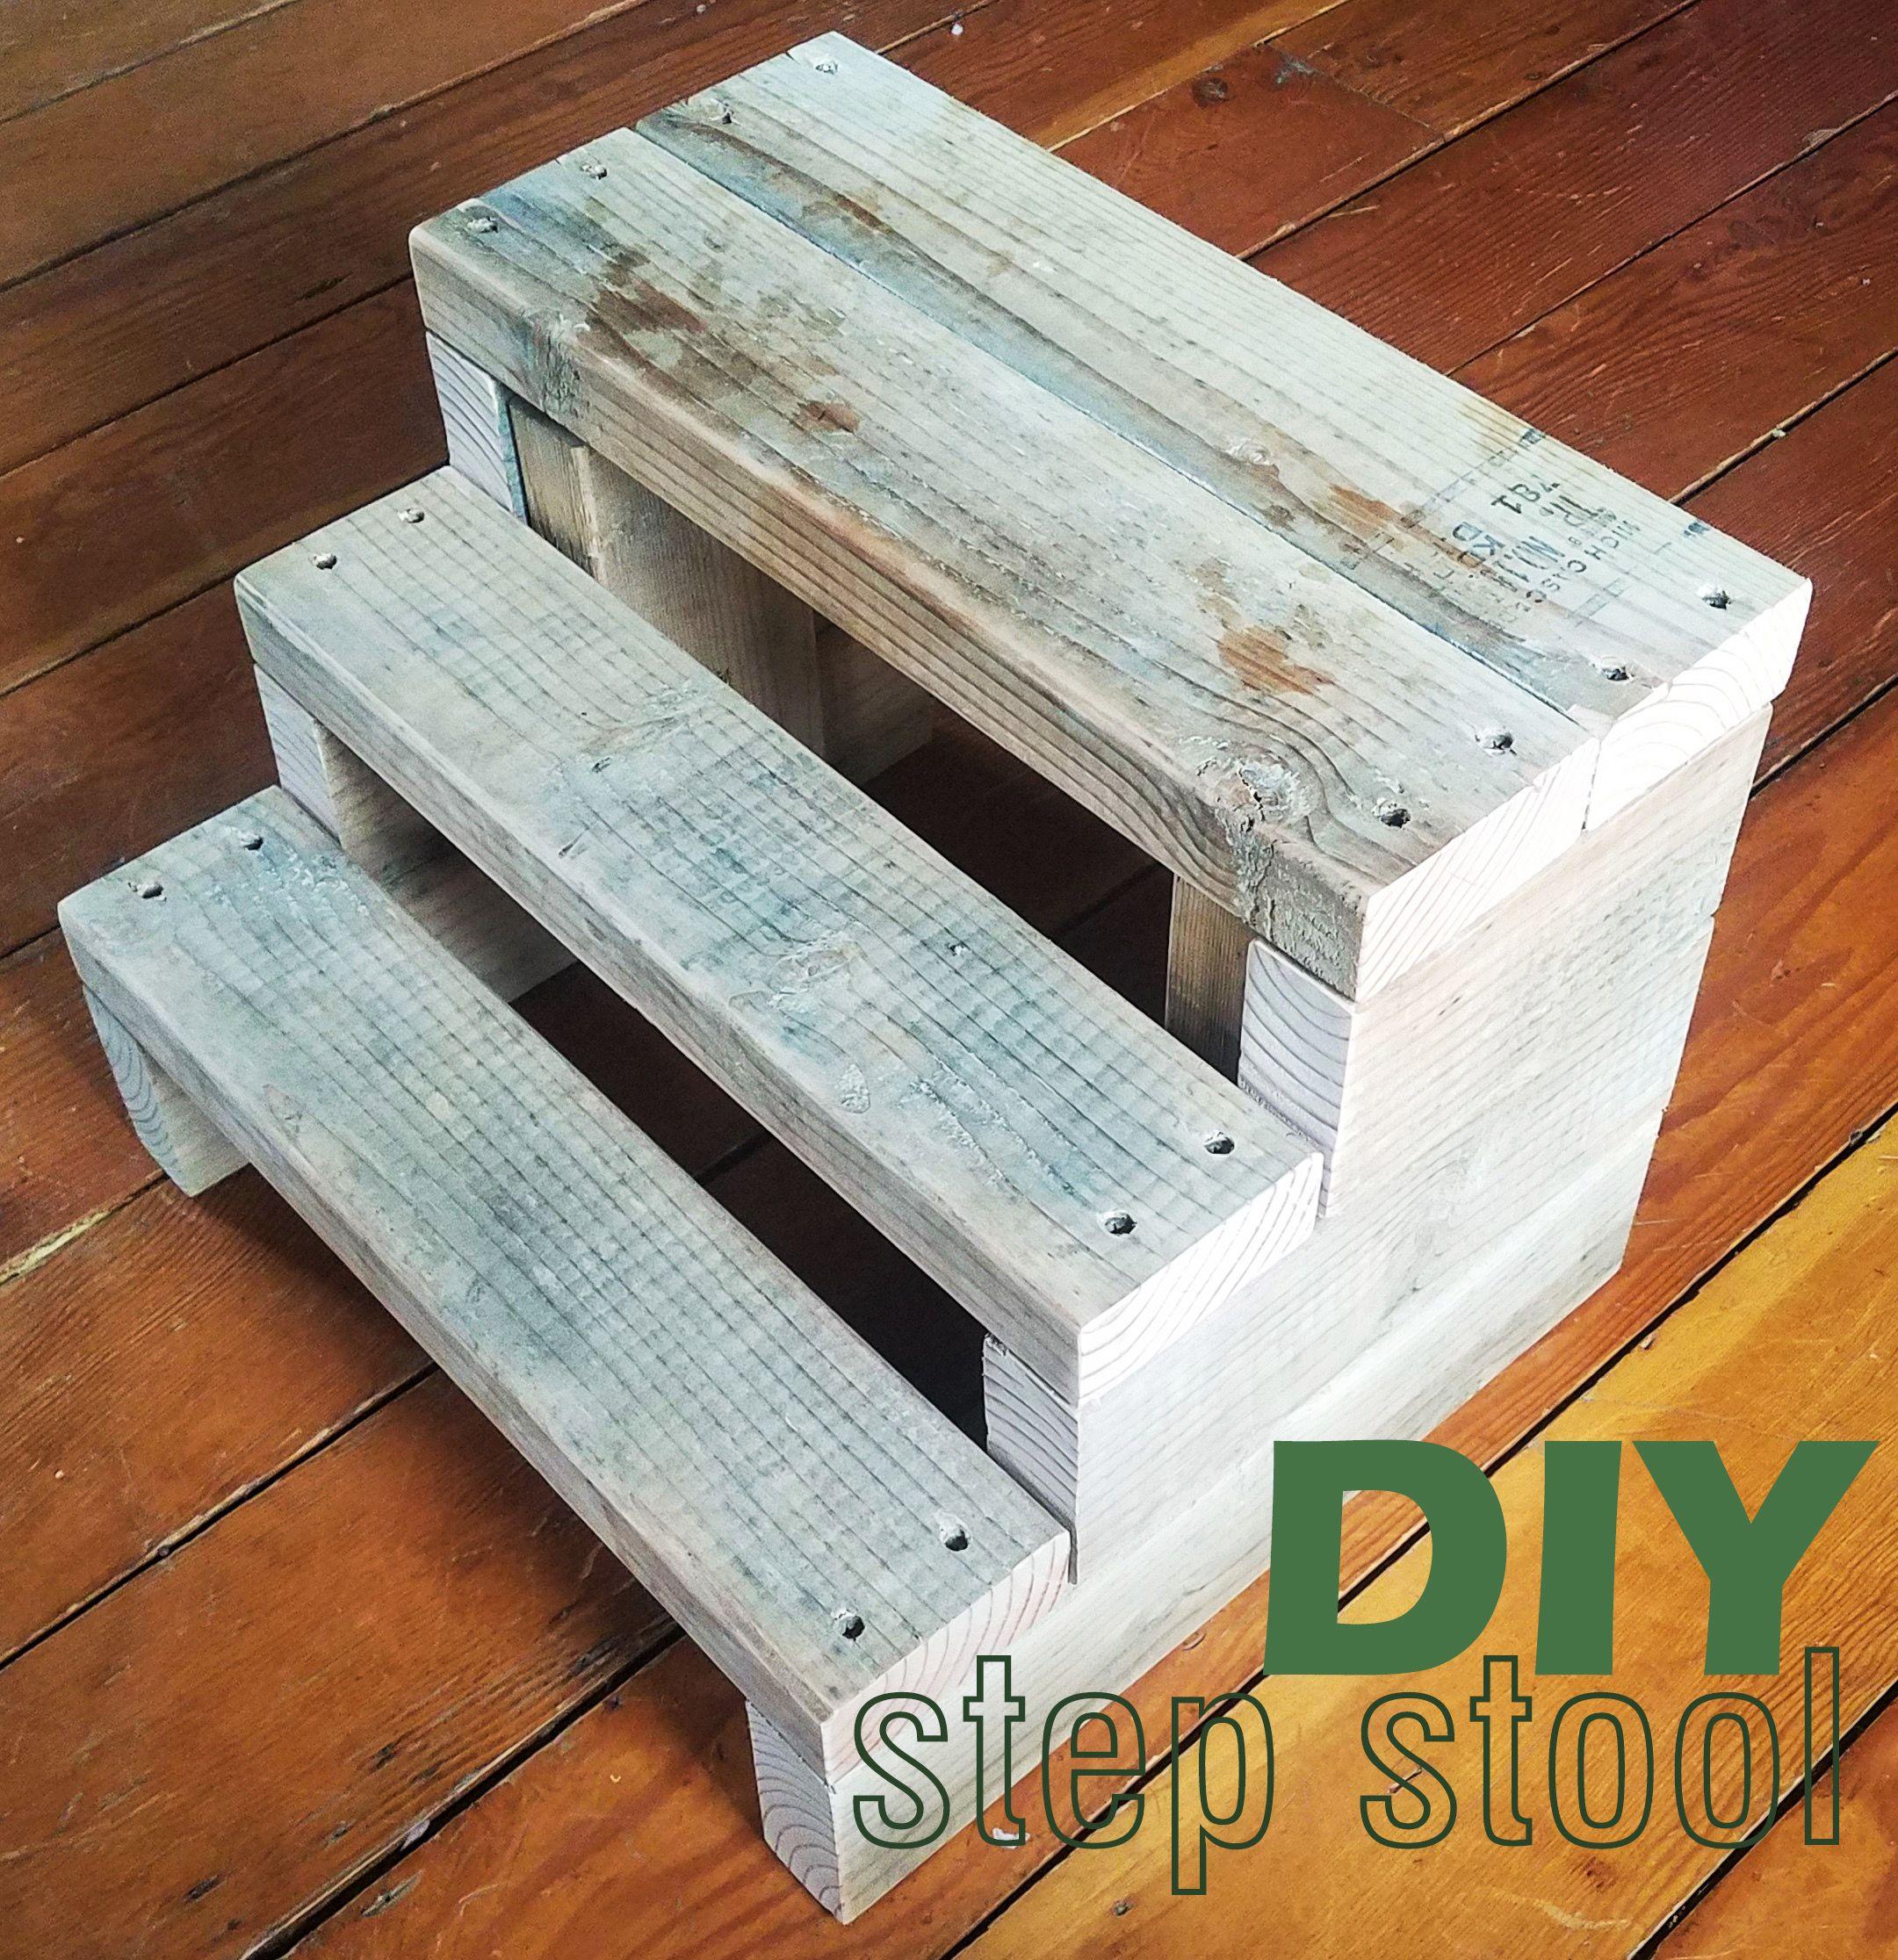 Diy 2x4 Step Stool In 2020 Step Stool Diy Step Stool Wooden Step Stool